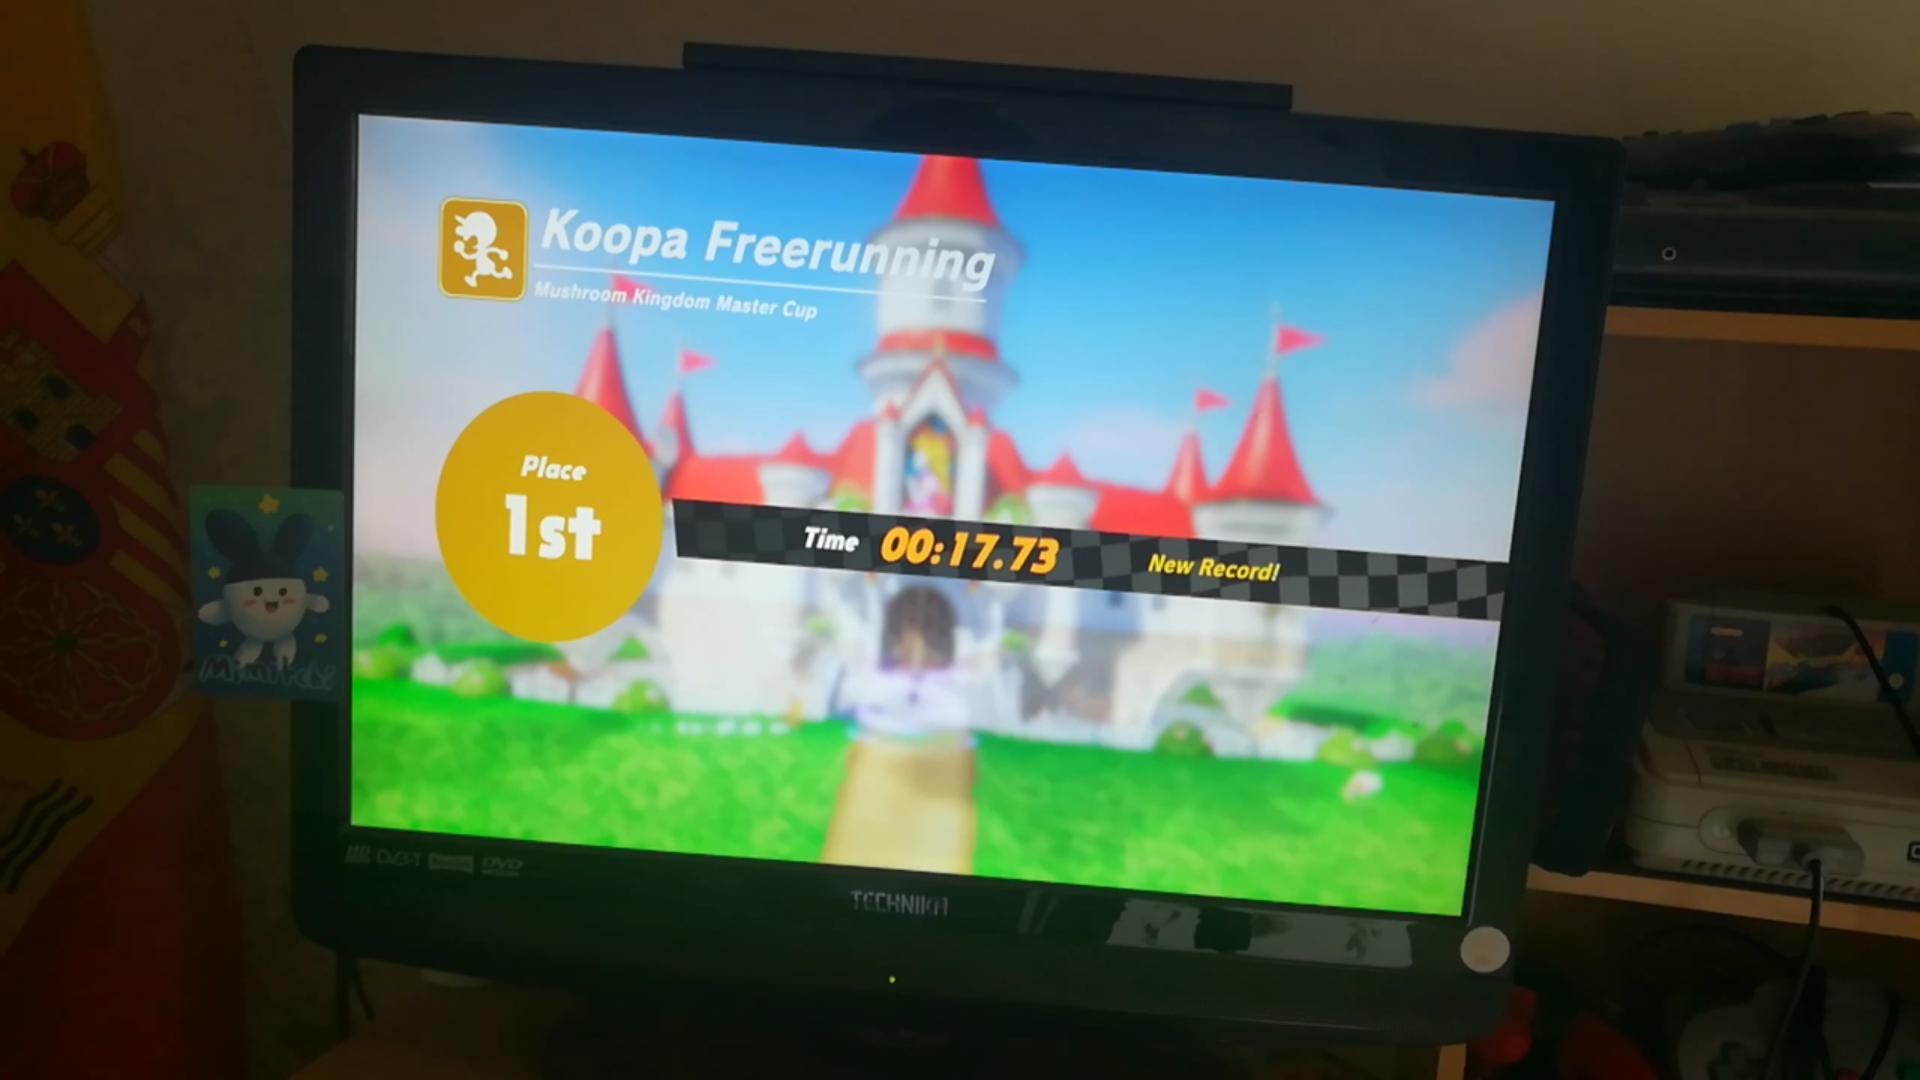 Super Mario Odyssey: Koopa Freerunning: Mushroom Kingdom time of 0:00:17.73